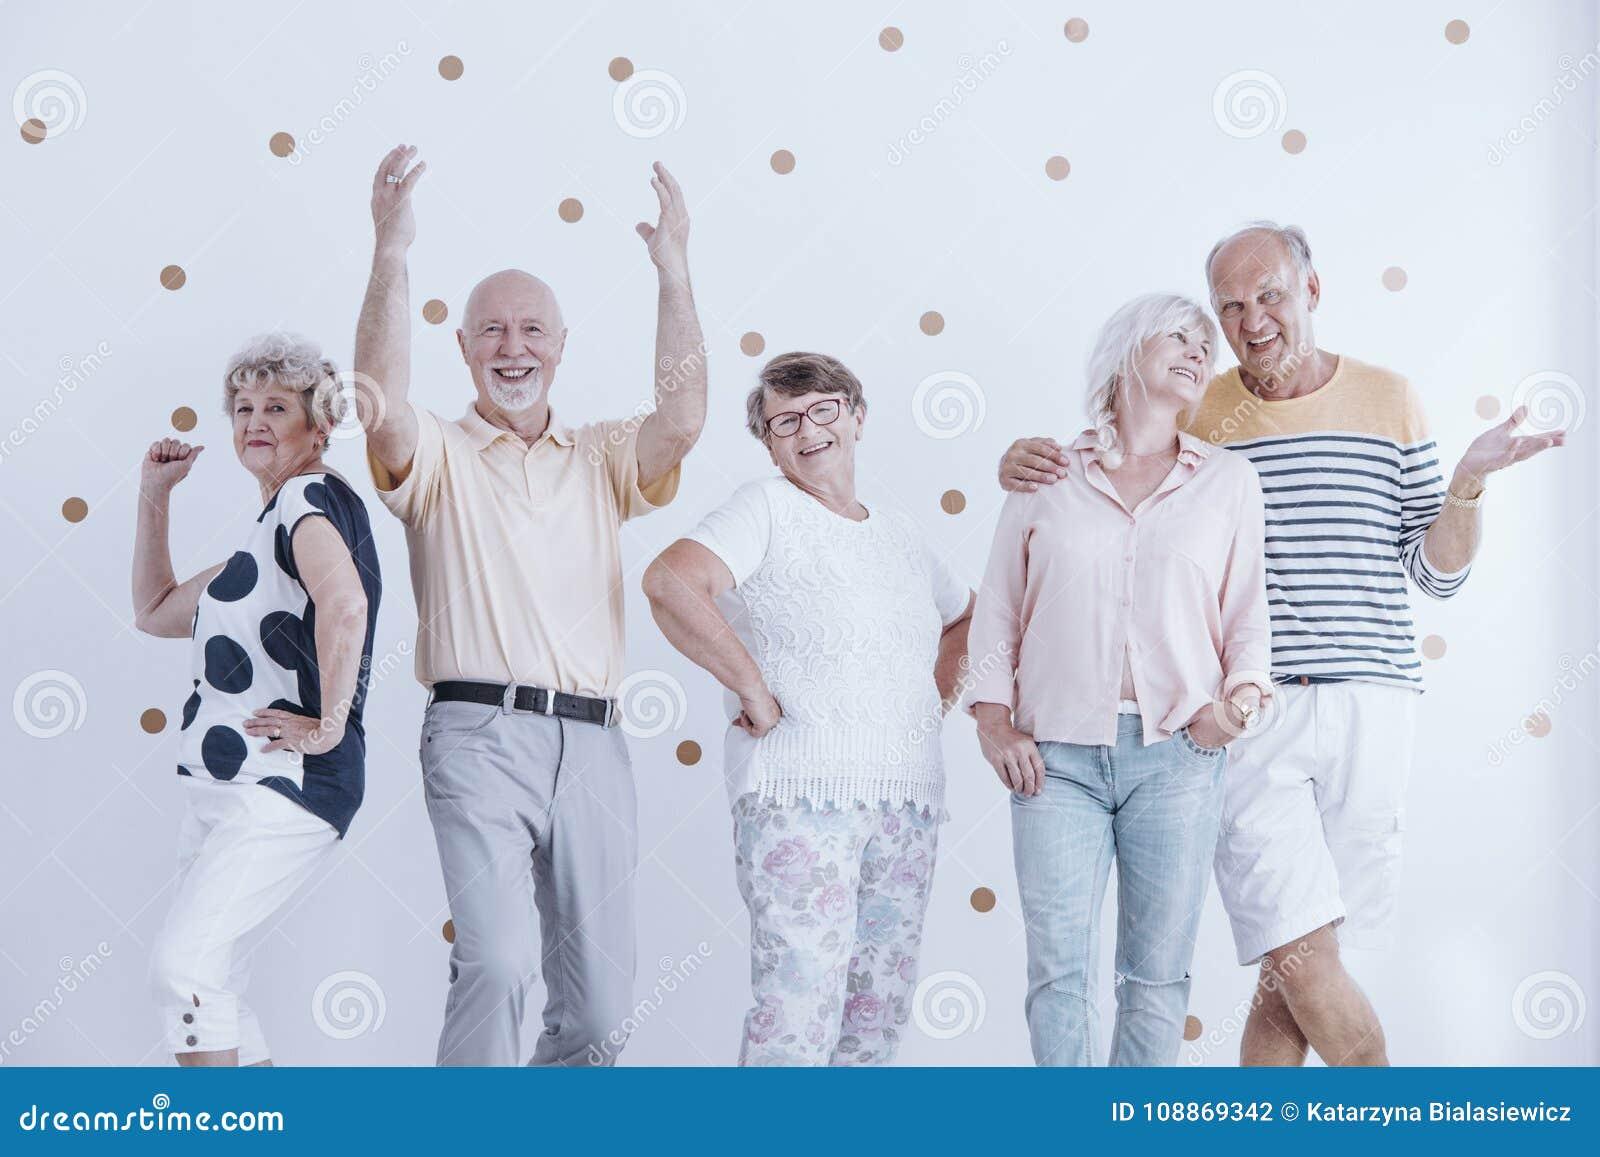 Elderly friends dancing and talking